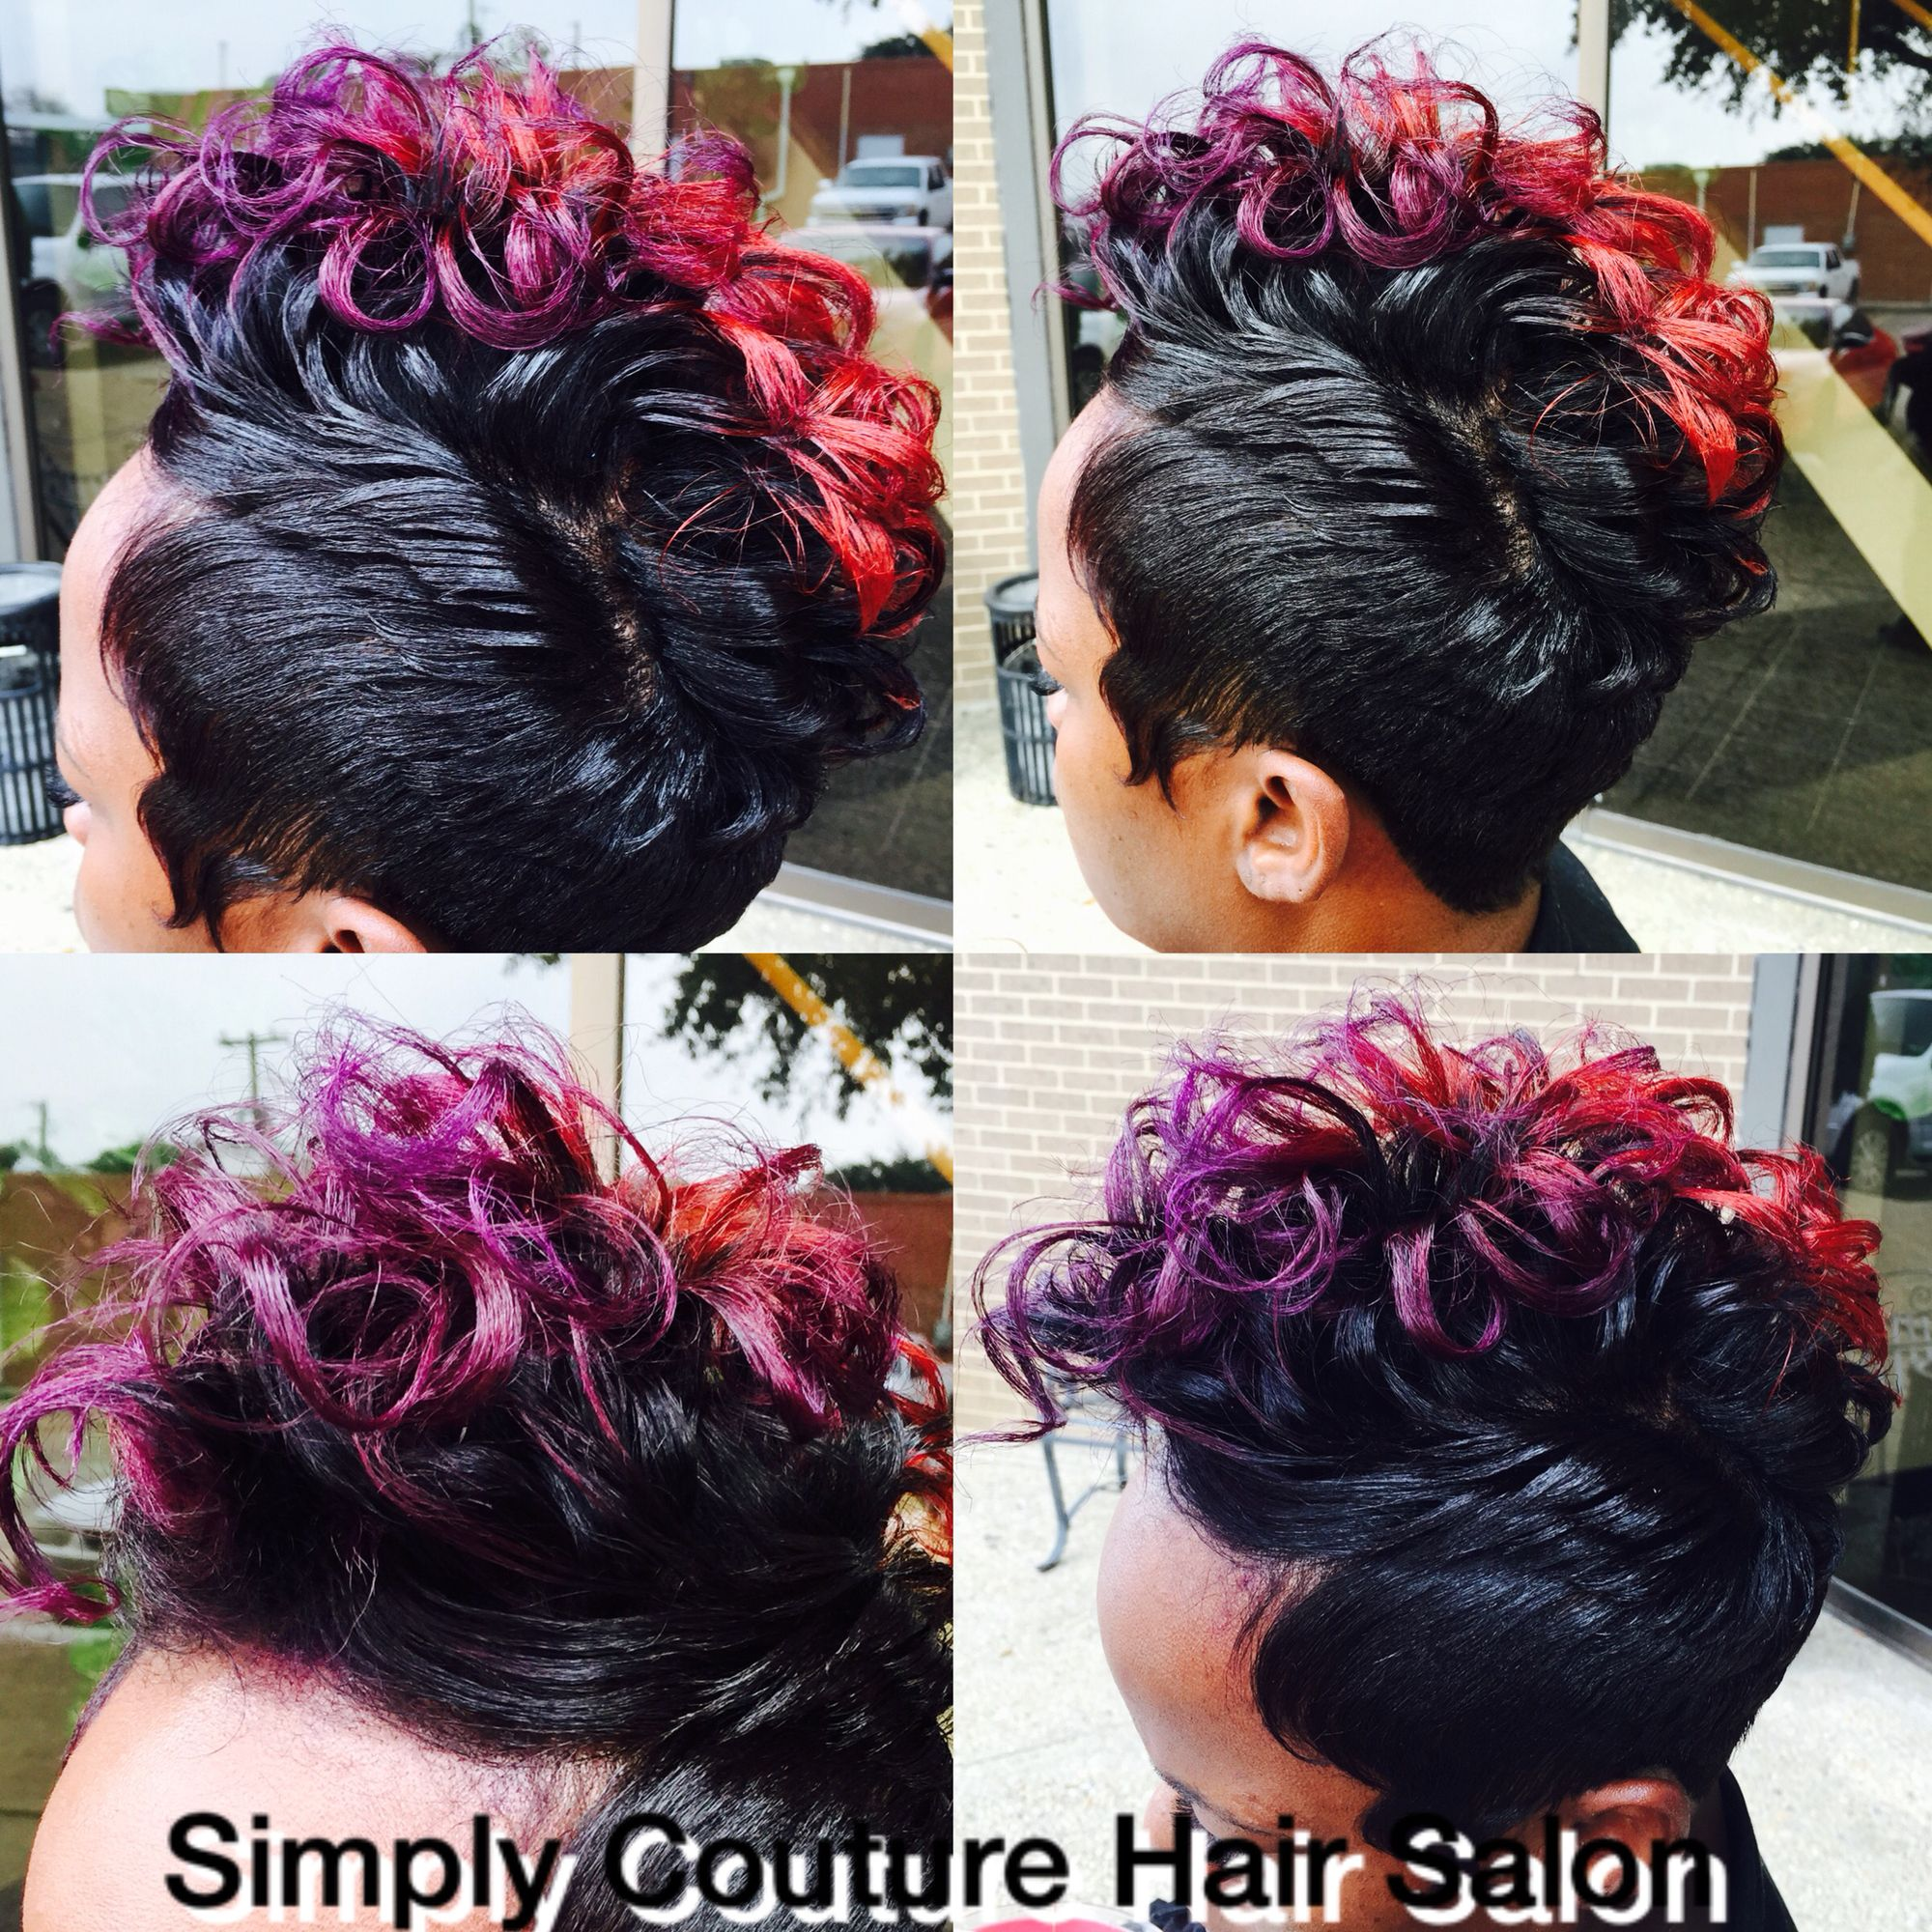 simply couture hair salon dallas tx | hairstyles | pinterest